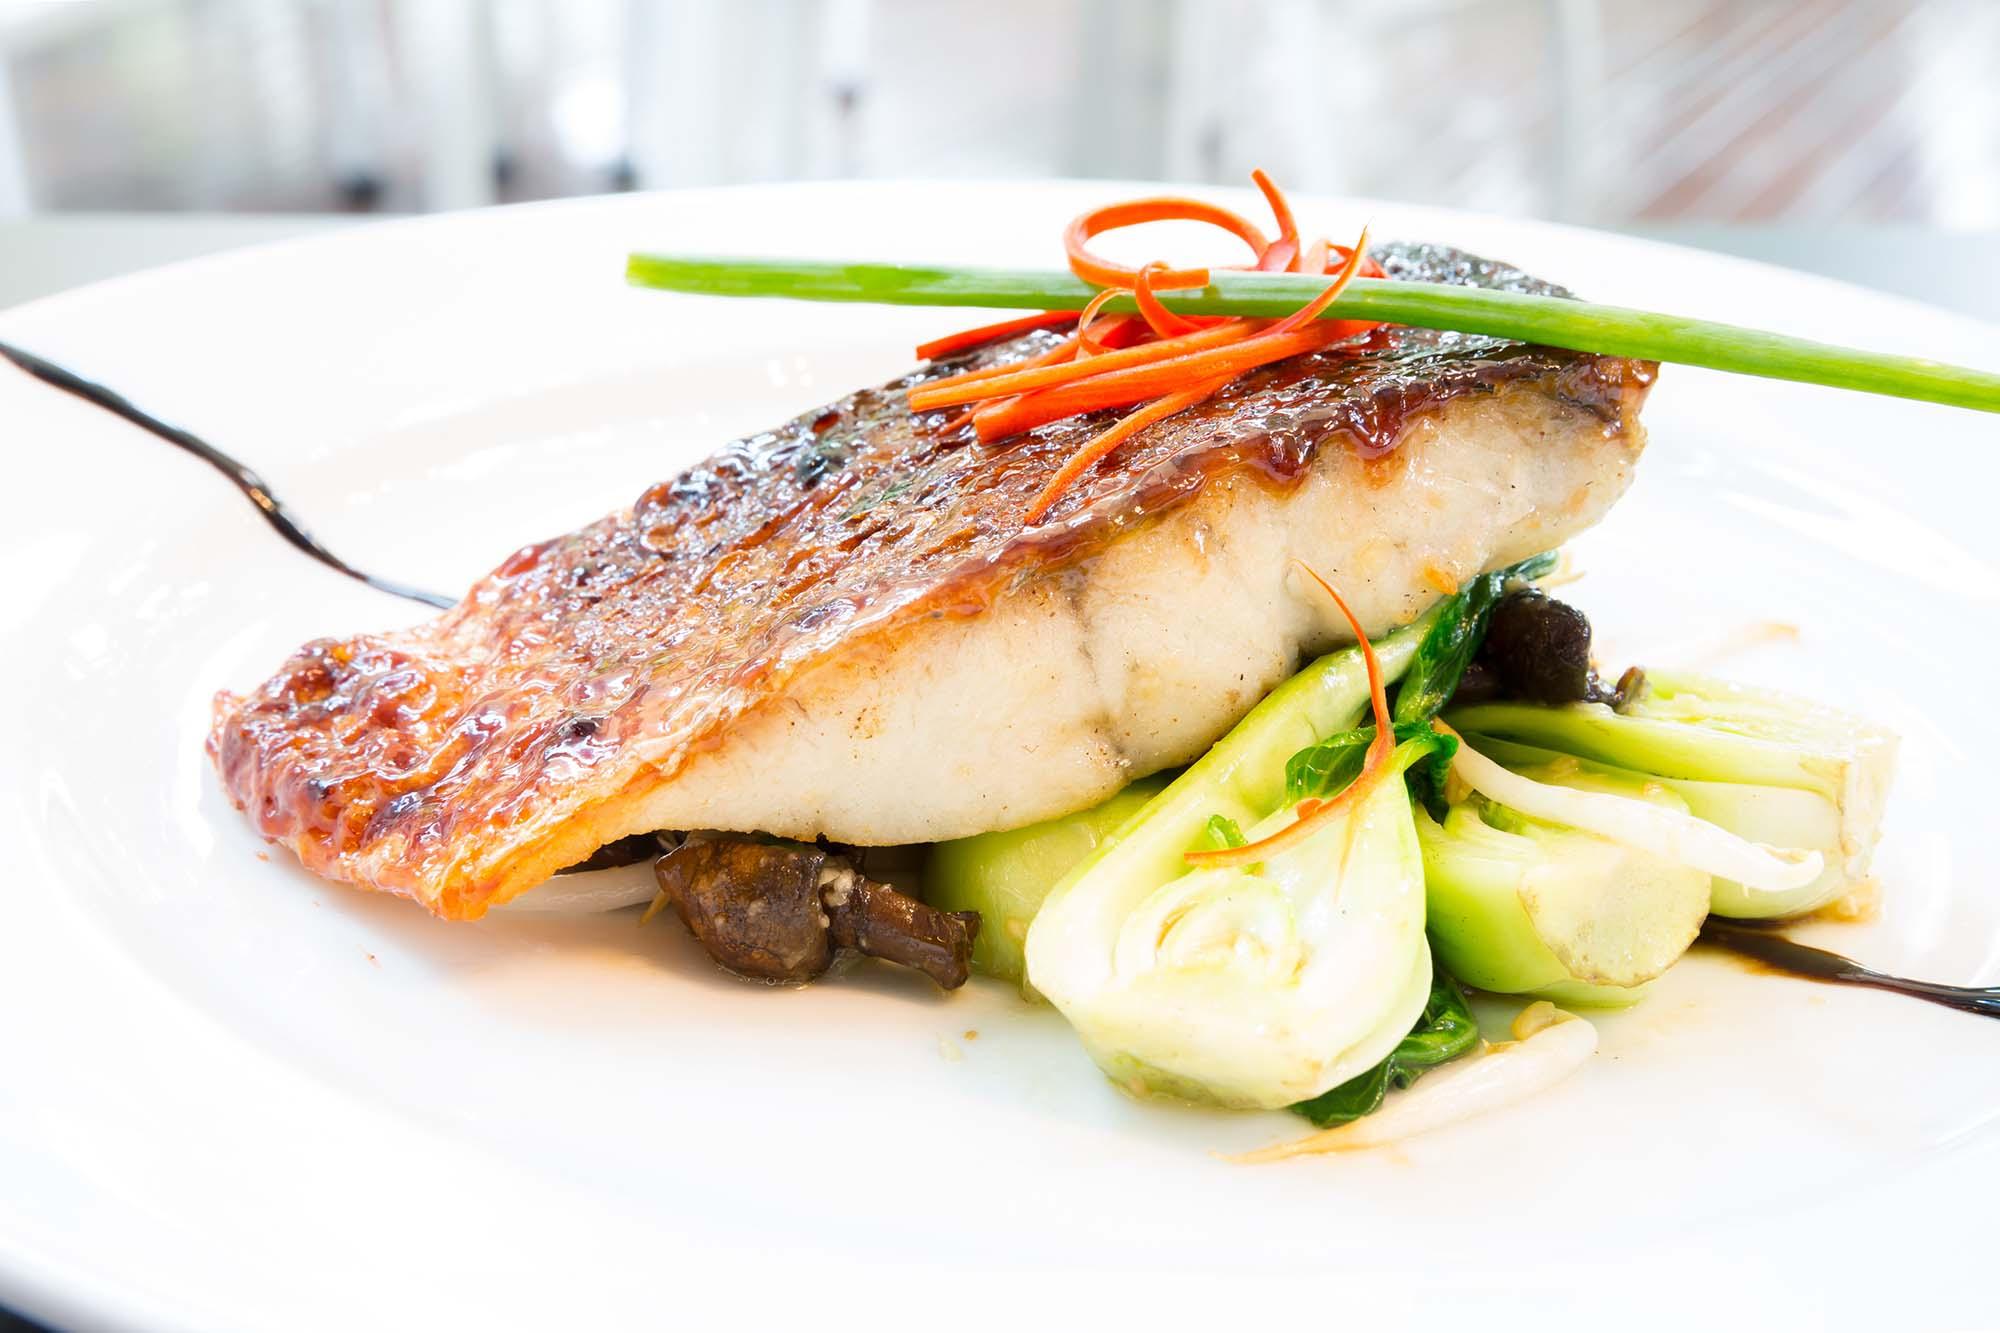 Bj rnstad catering - Cuisiner poisson blanc ...